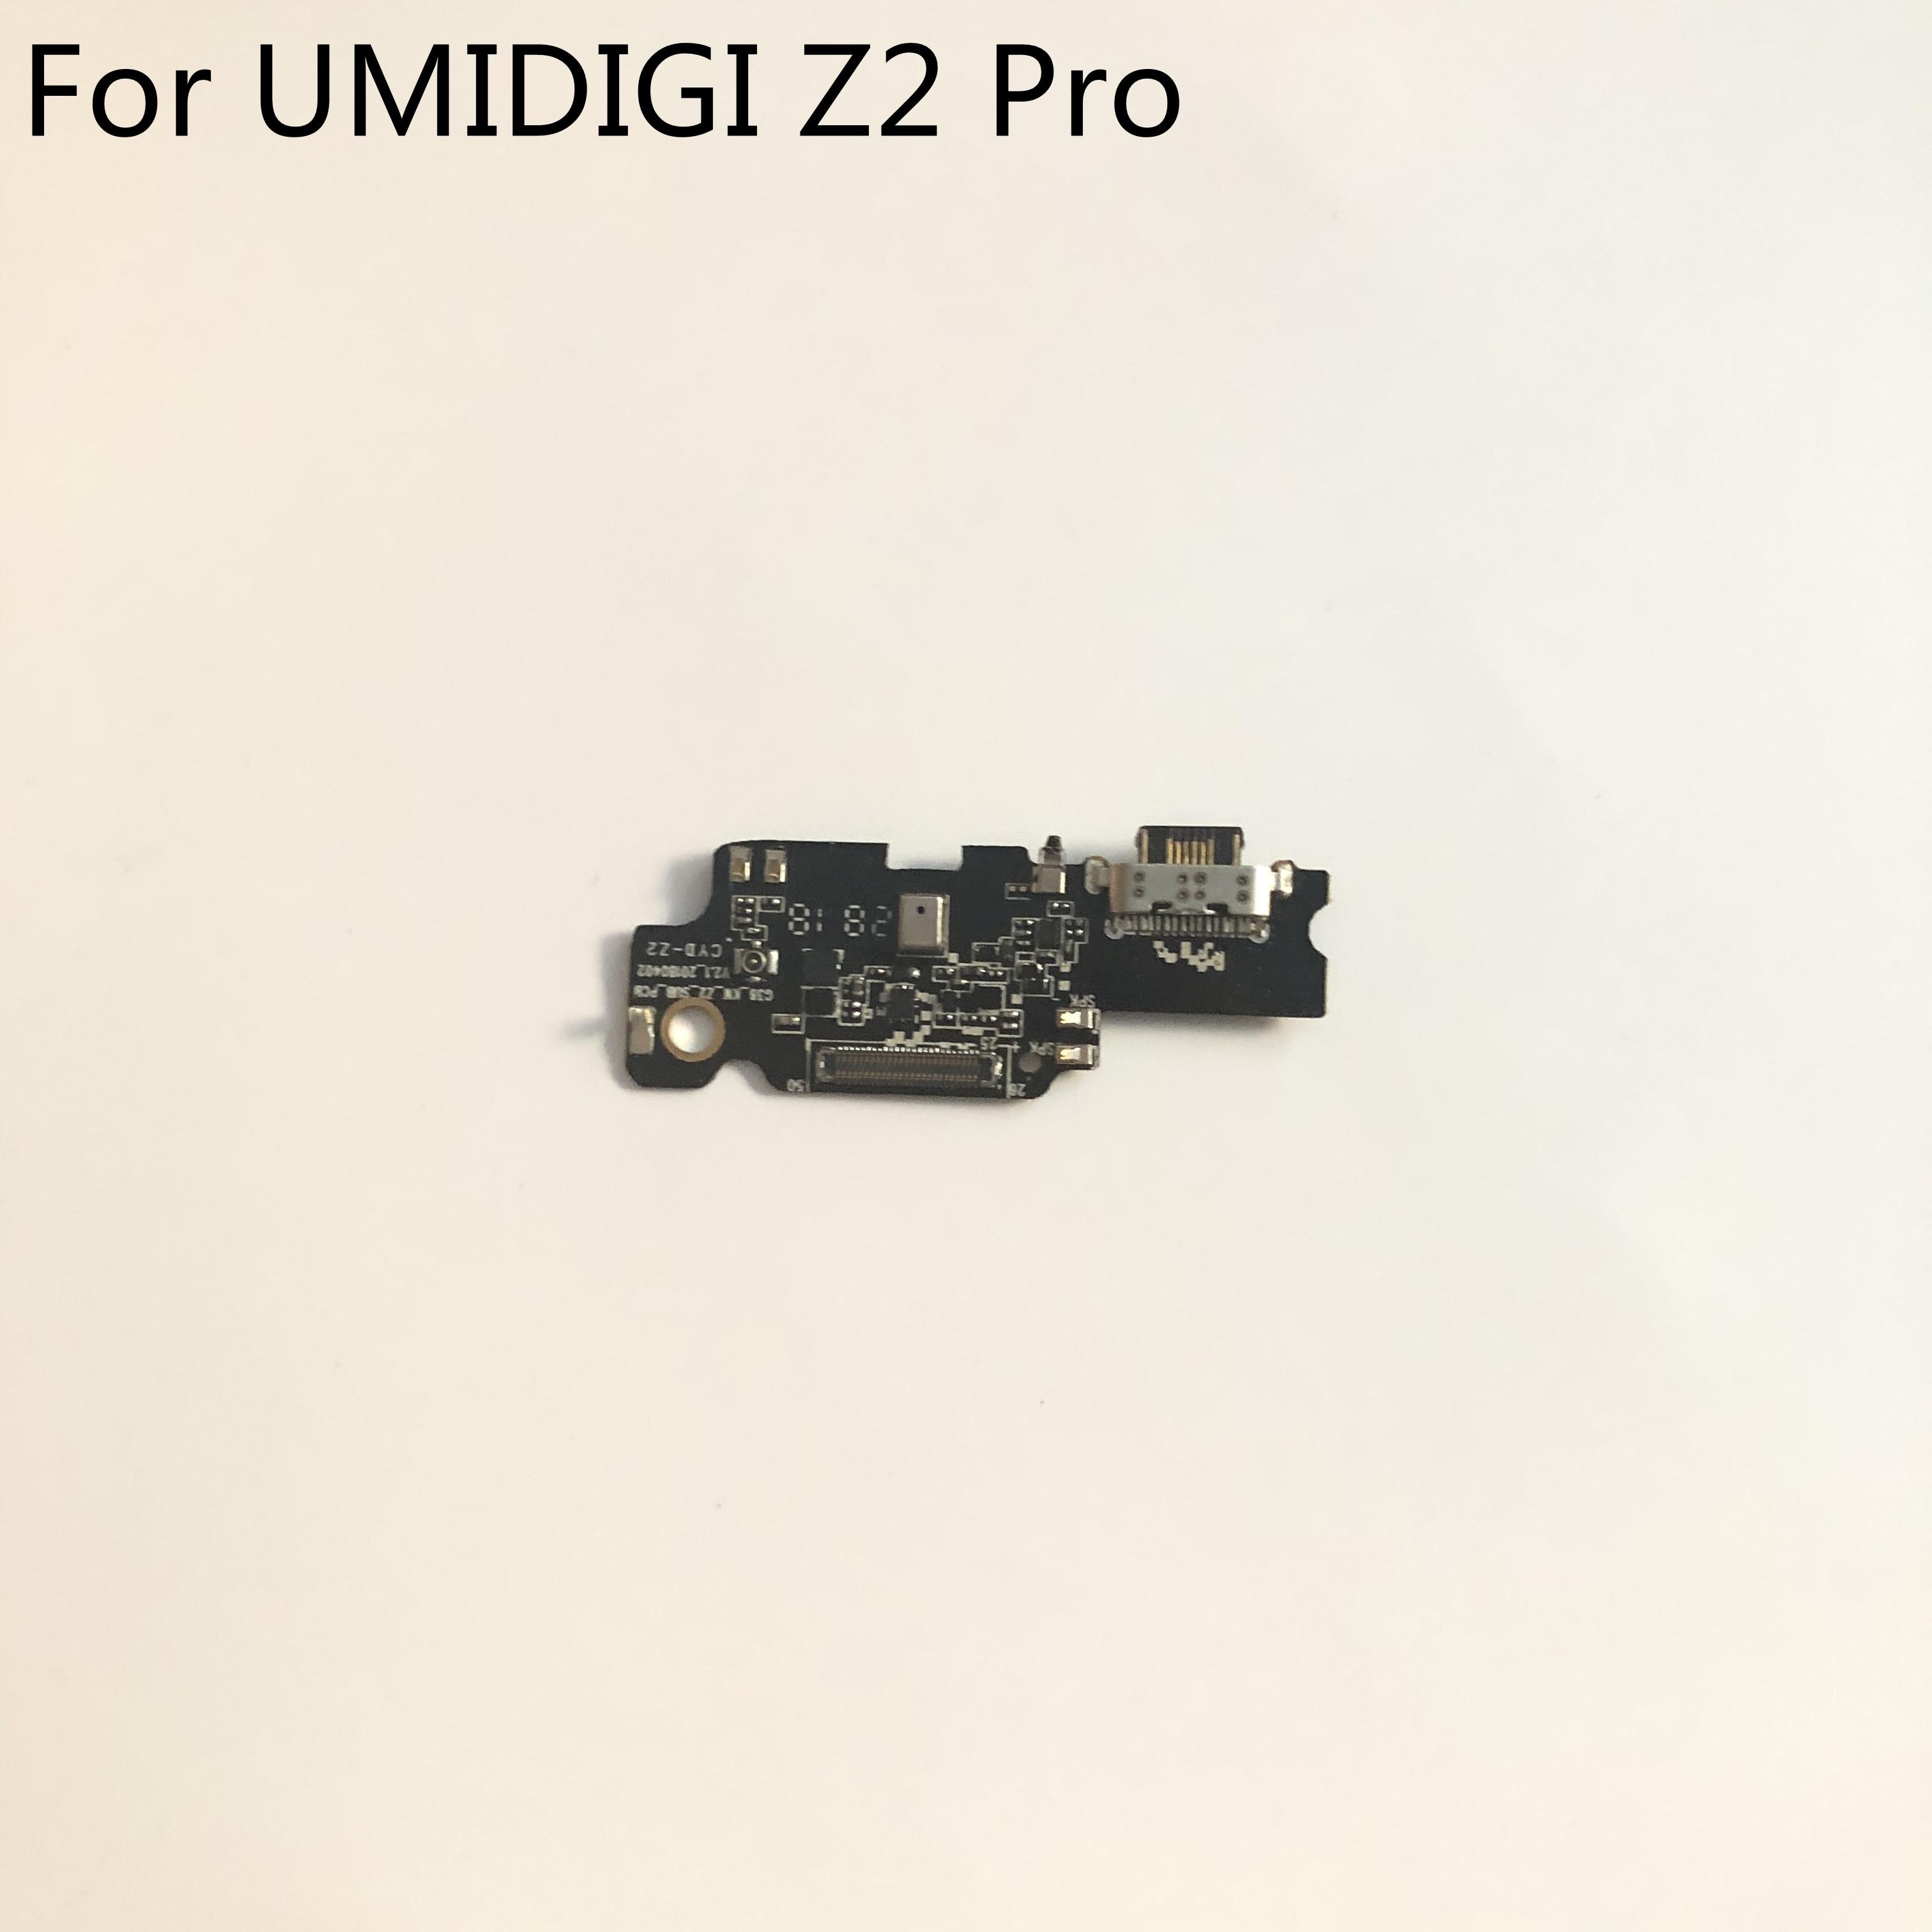 UMIDIGI Z2 Pro Used USB Plug Charge Board For UMIDIGI Z2 Pro MTK6771 Helio P60 6.2